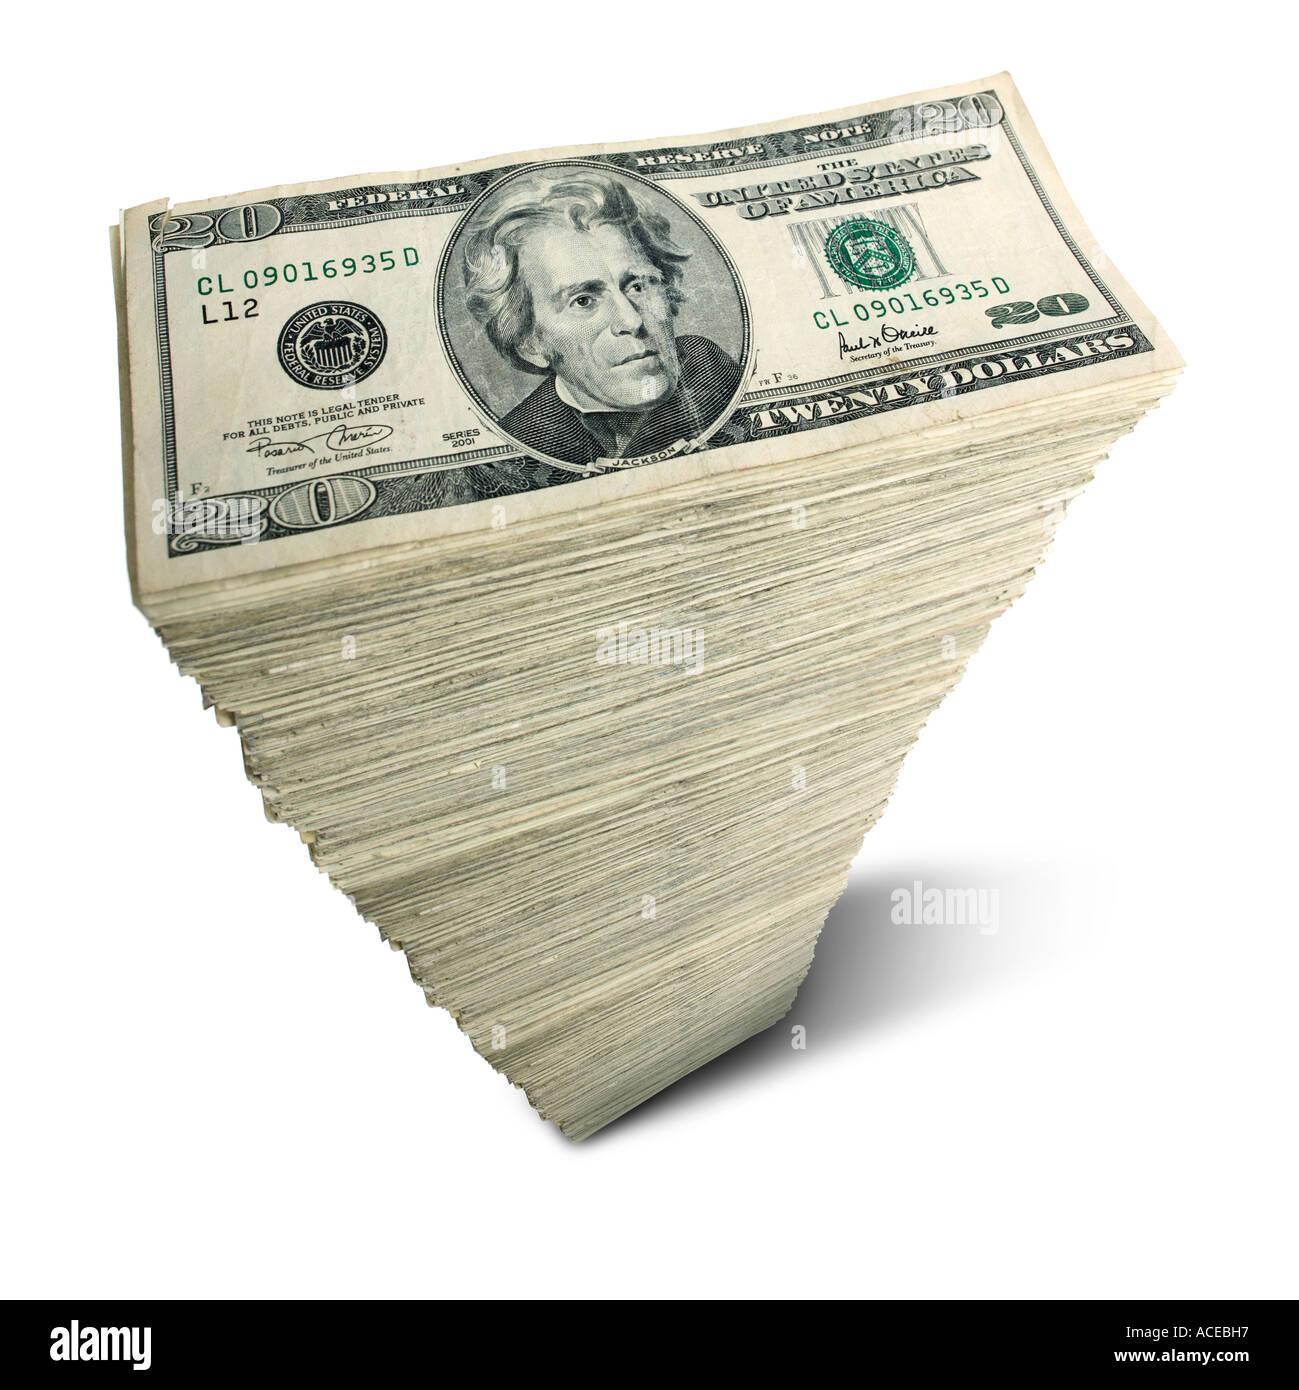 Stack of US 20 dollar bills - Stock Image